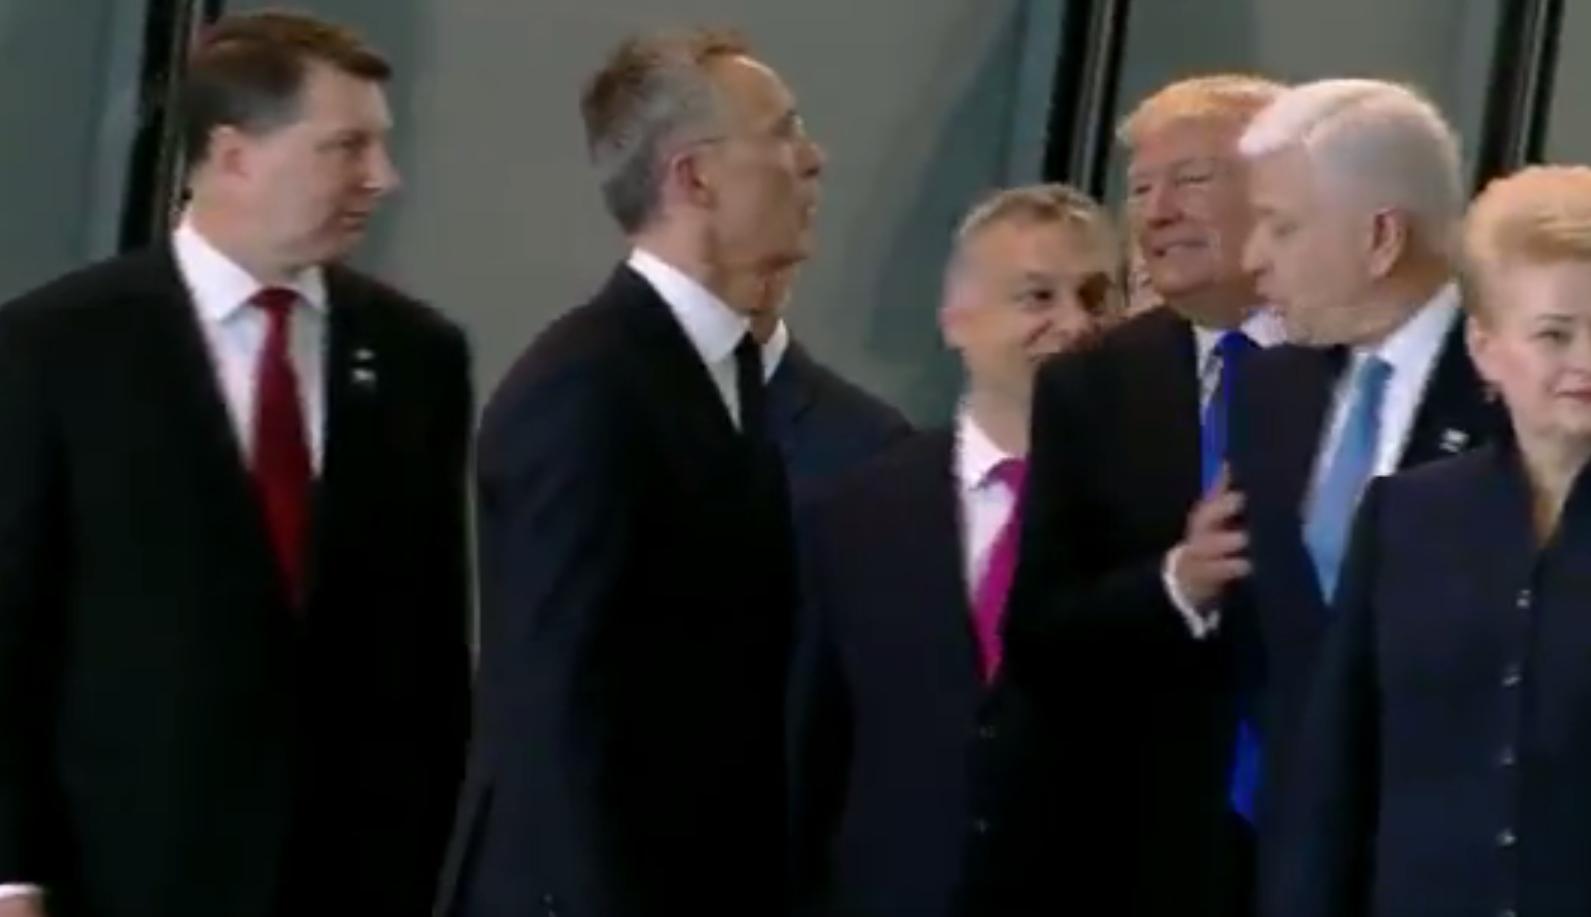 Trump shoves NATO leader